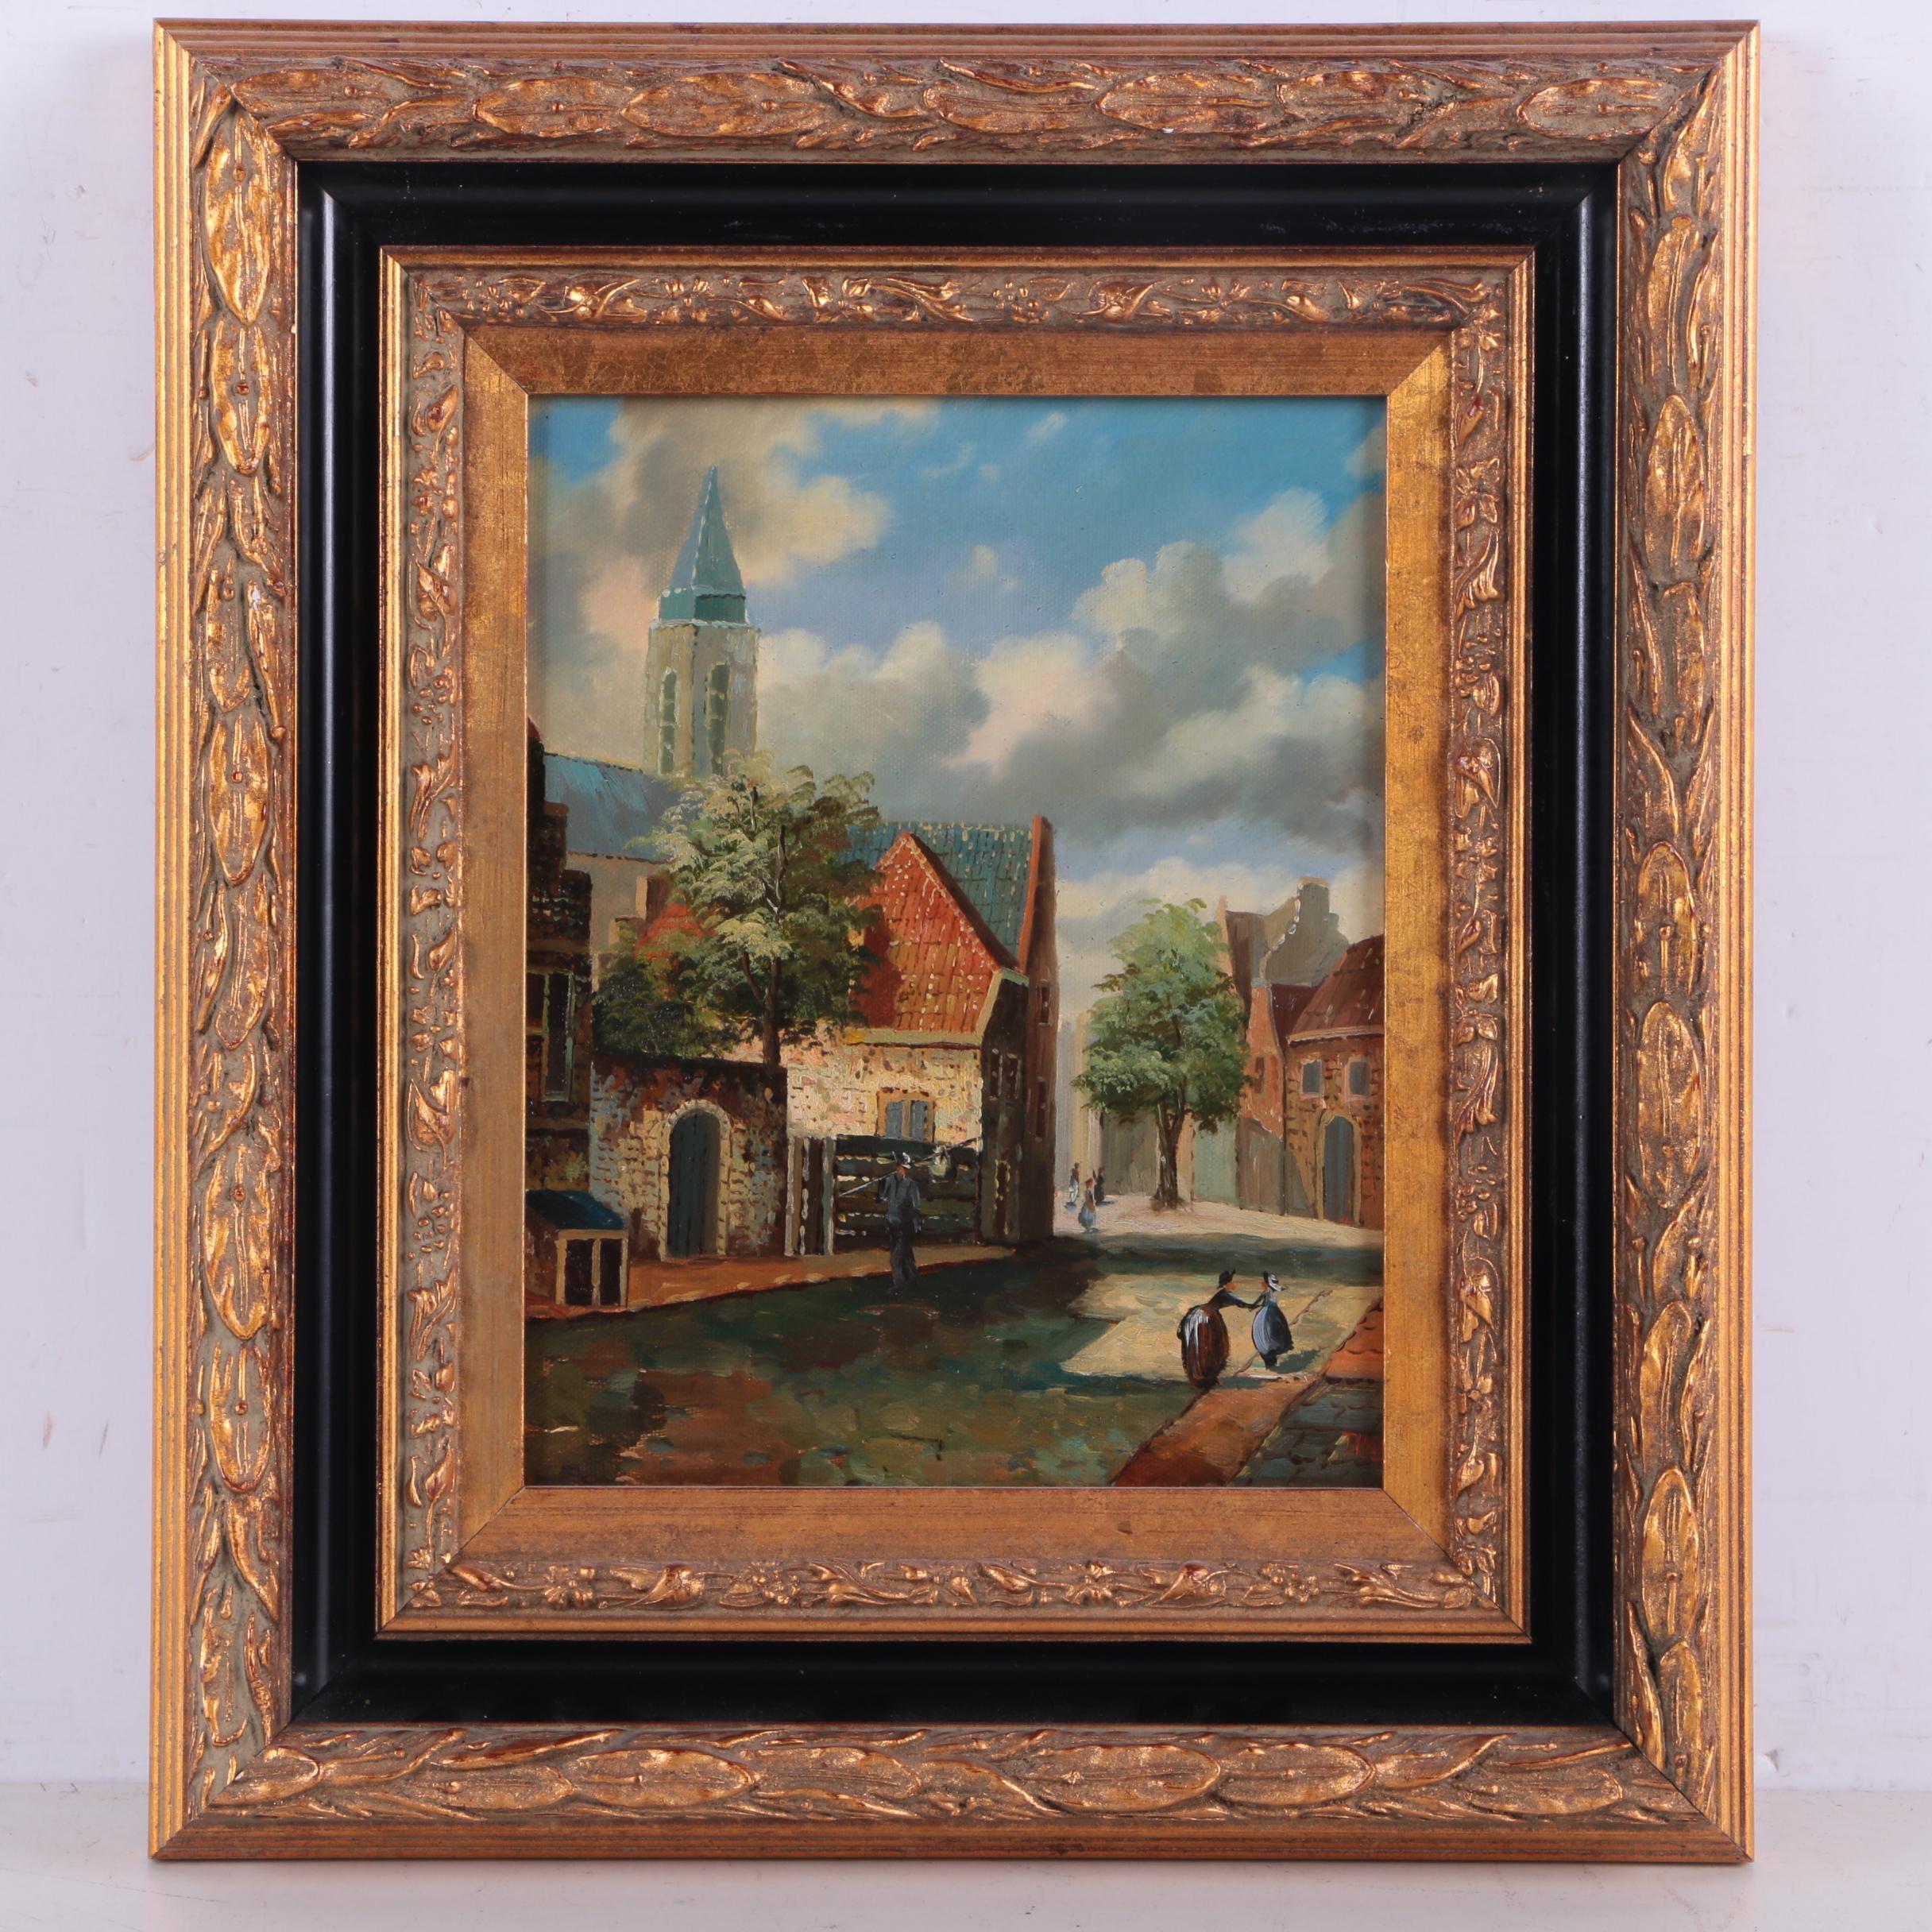 Thomas Oil Painting on Canvas of Village Scene